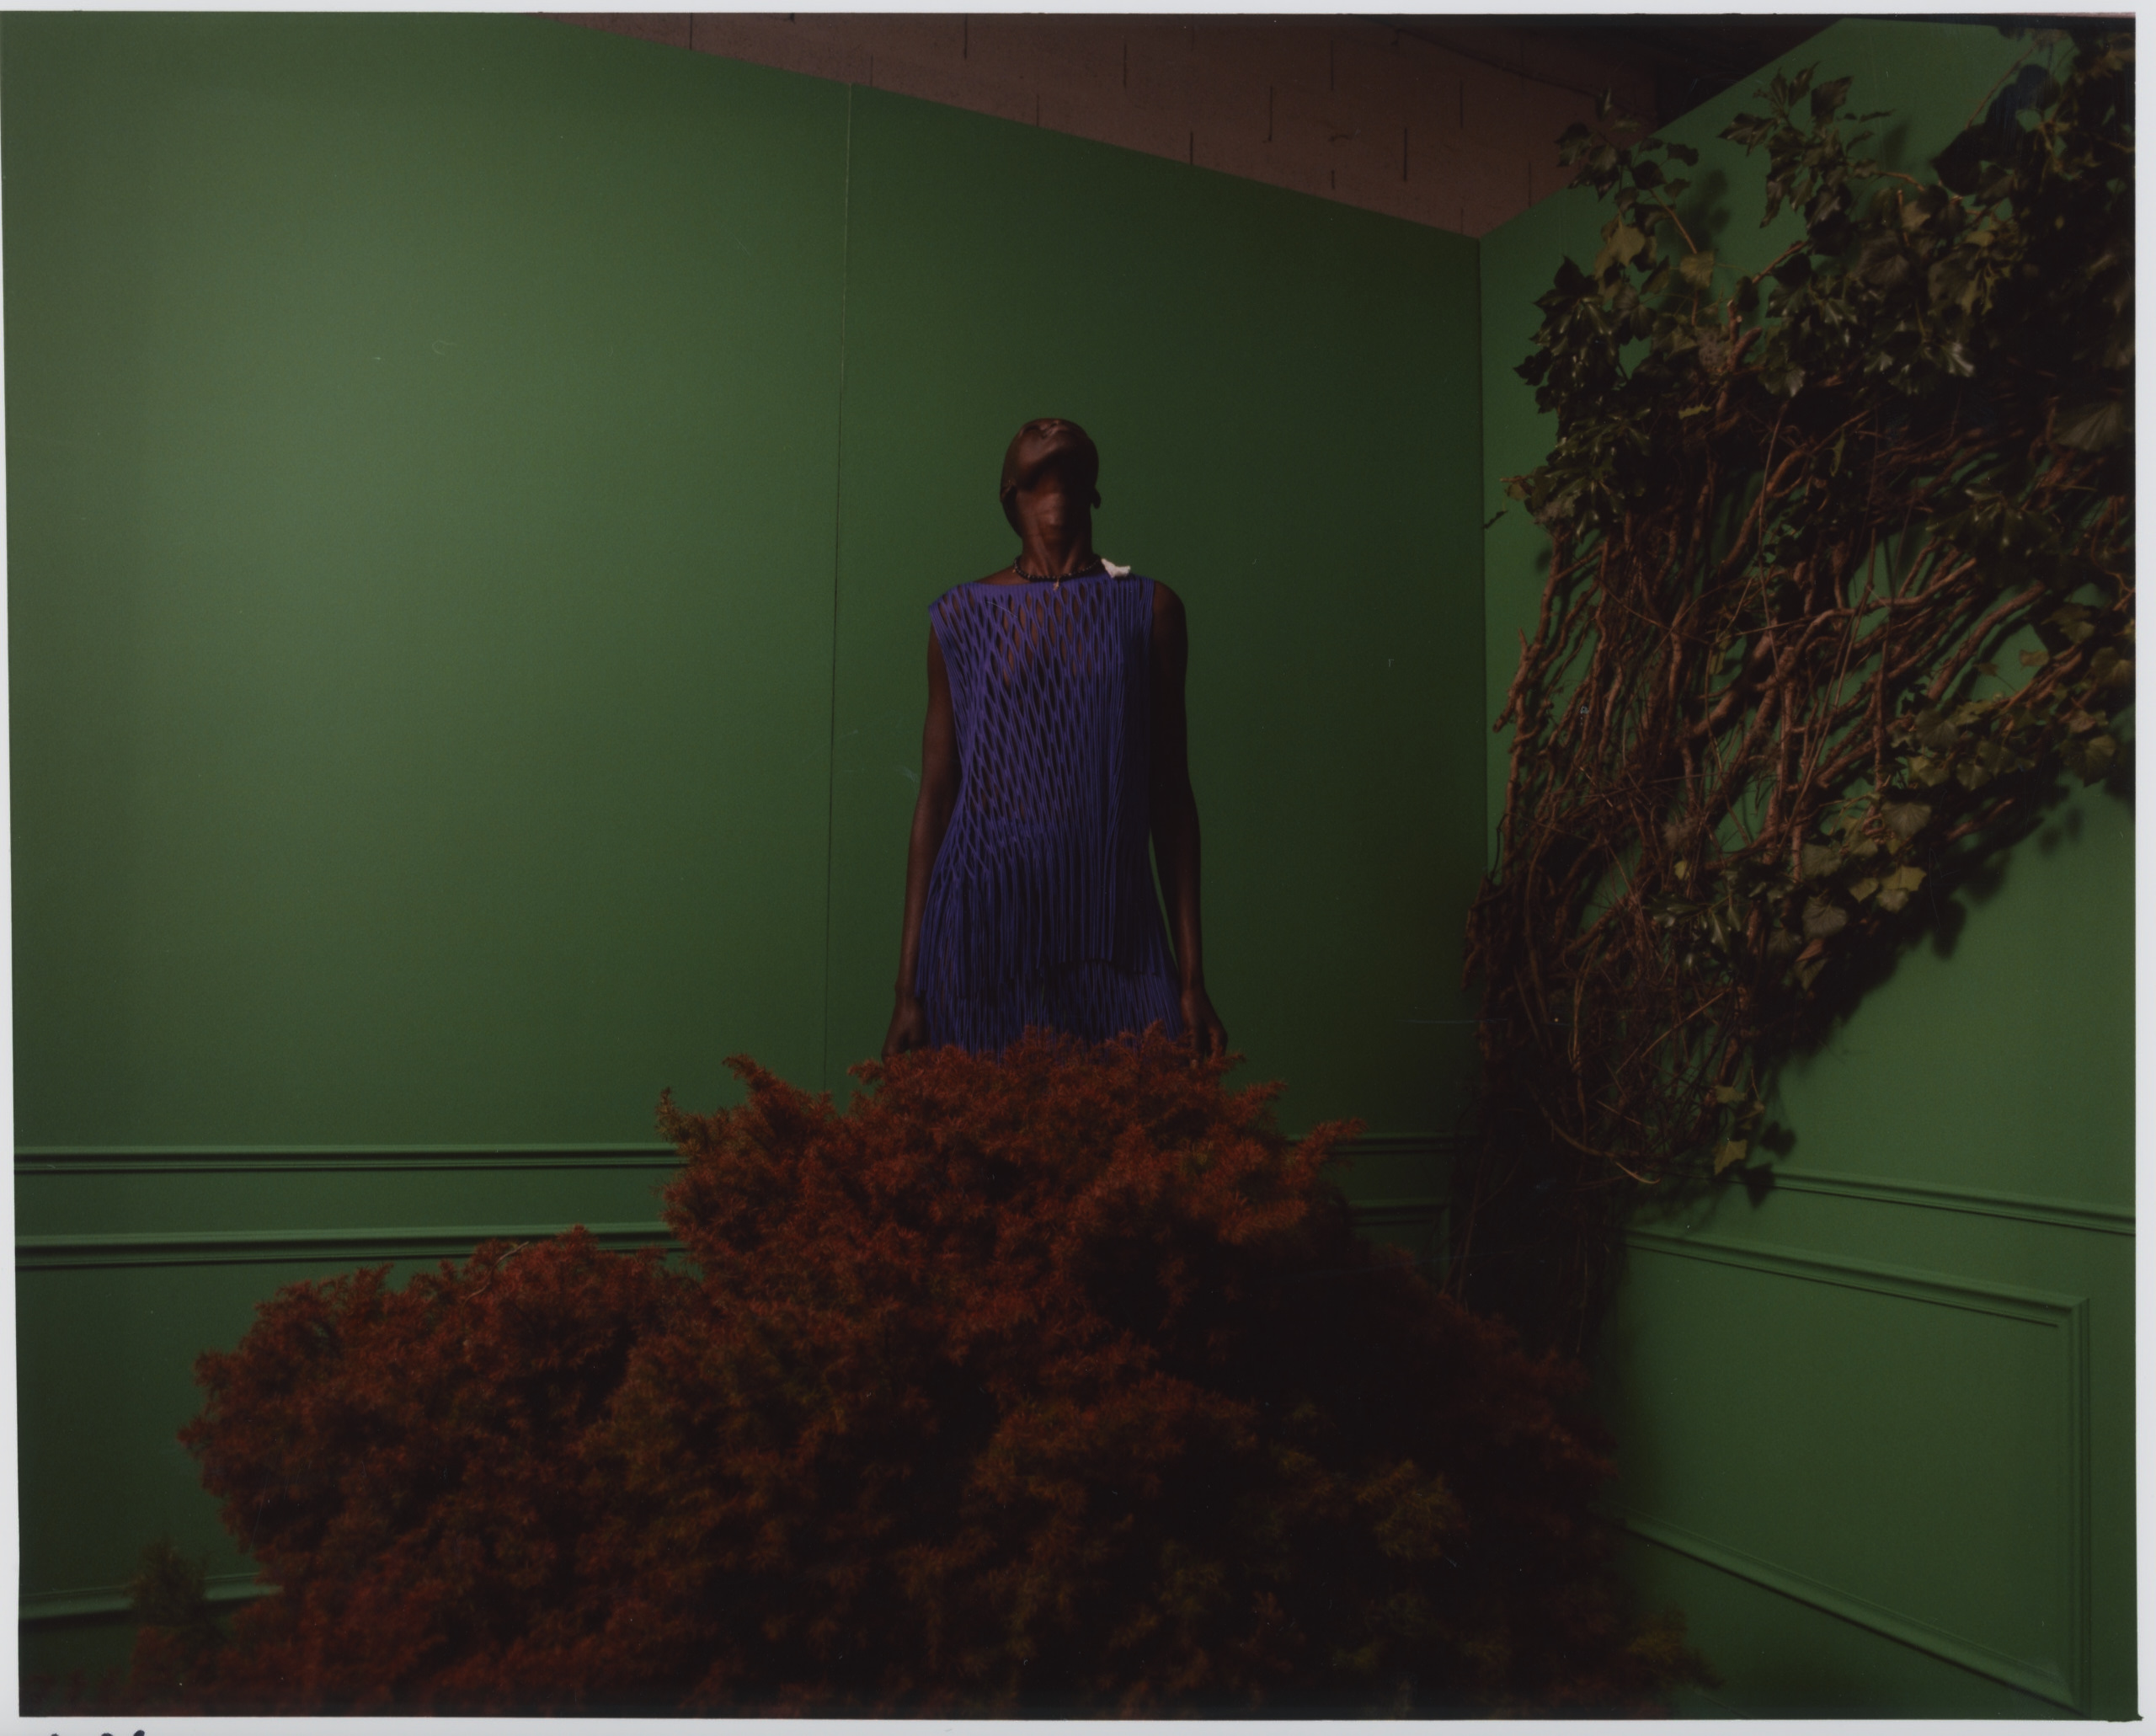 Haut et jupe en mesh, ISSEY MIYAKE. Collier, DIOR.